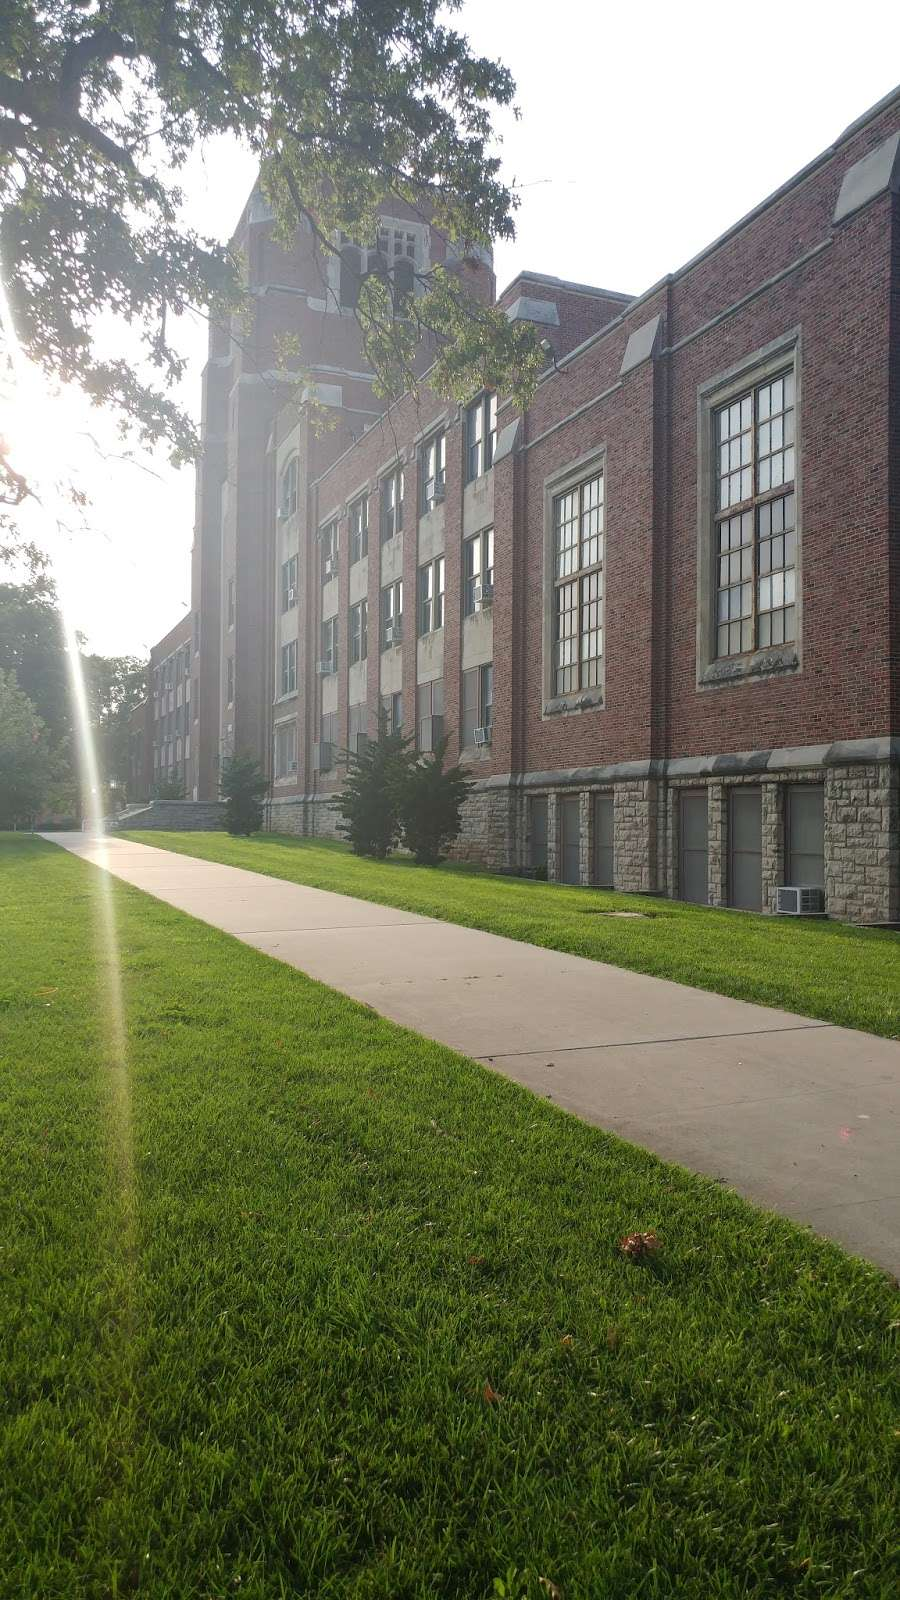 African-Centered College Preparatory Academy - school  | Photo 4 of 7 | Address: 3500 E Meyer Blvd, Kansas City, MO 64132, USA | Phone: (816) 418-1078